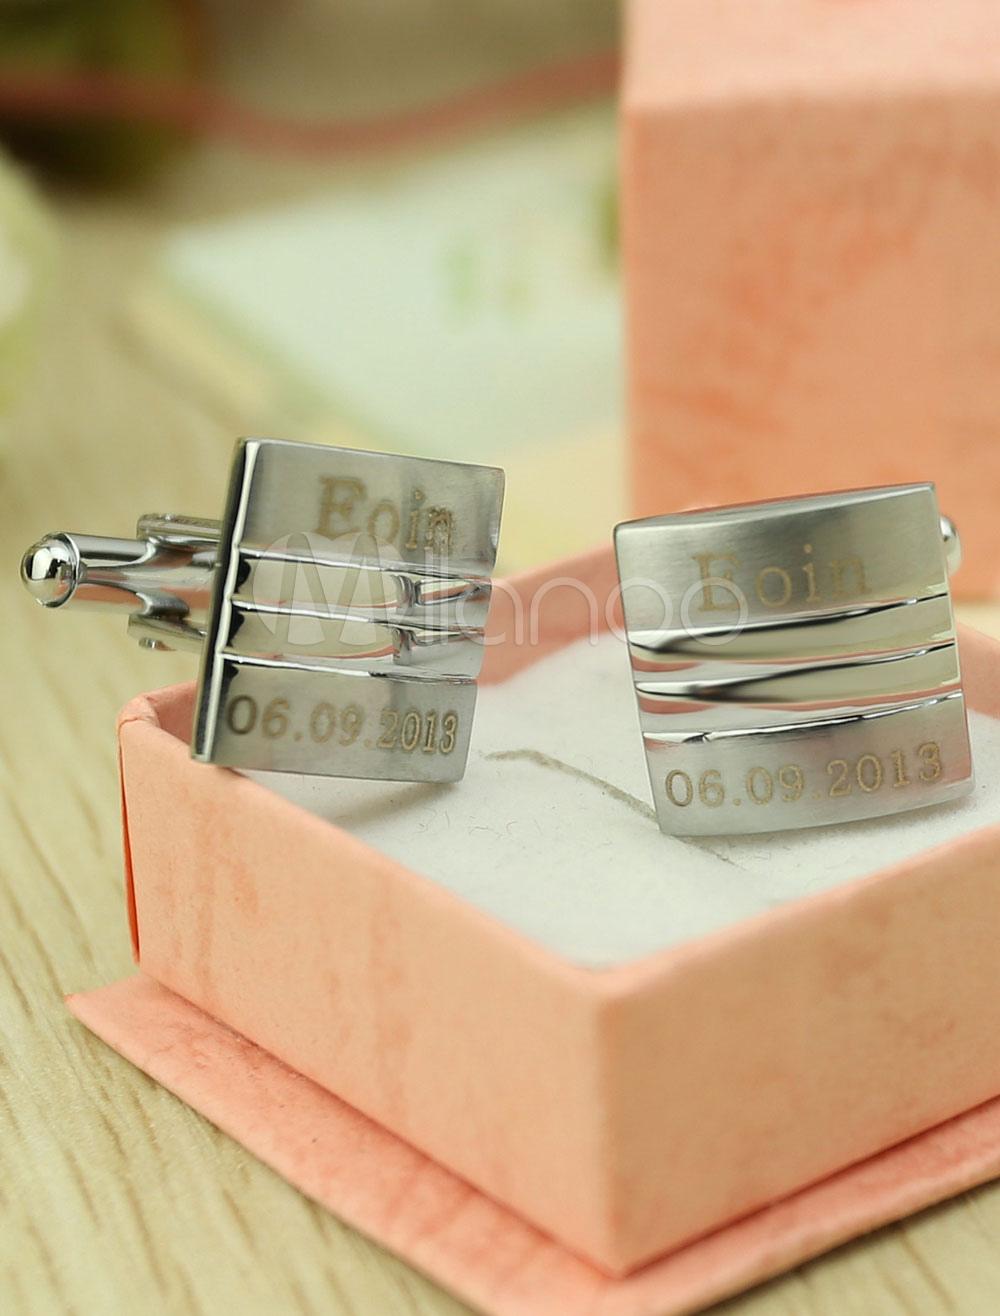 Personalised Wedding Cufflinks Silver Men's Name Date Customized Shirt Cufflinks Gift thumbnail